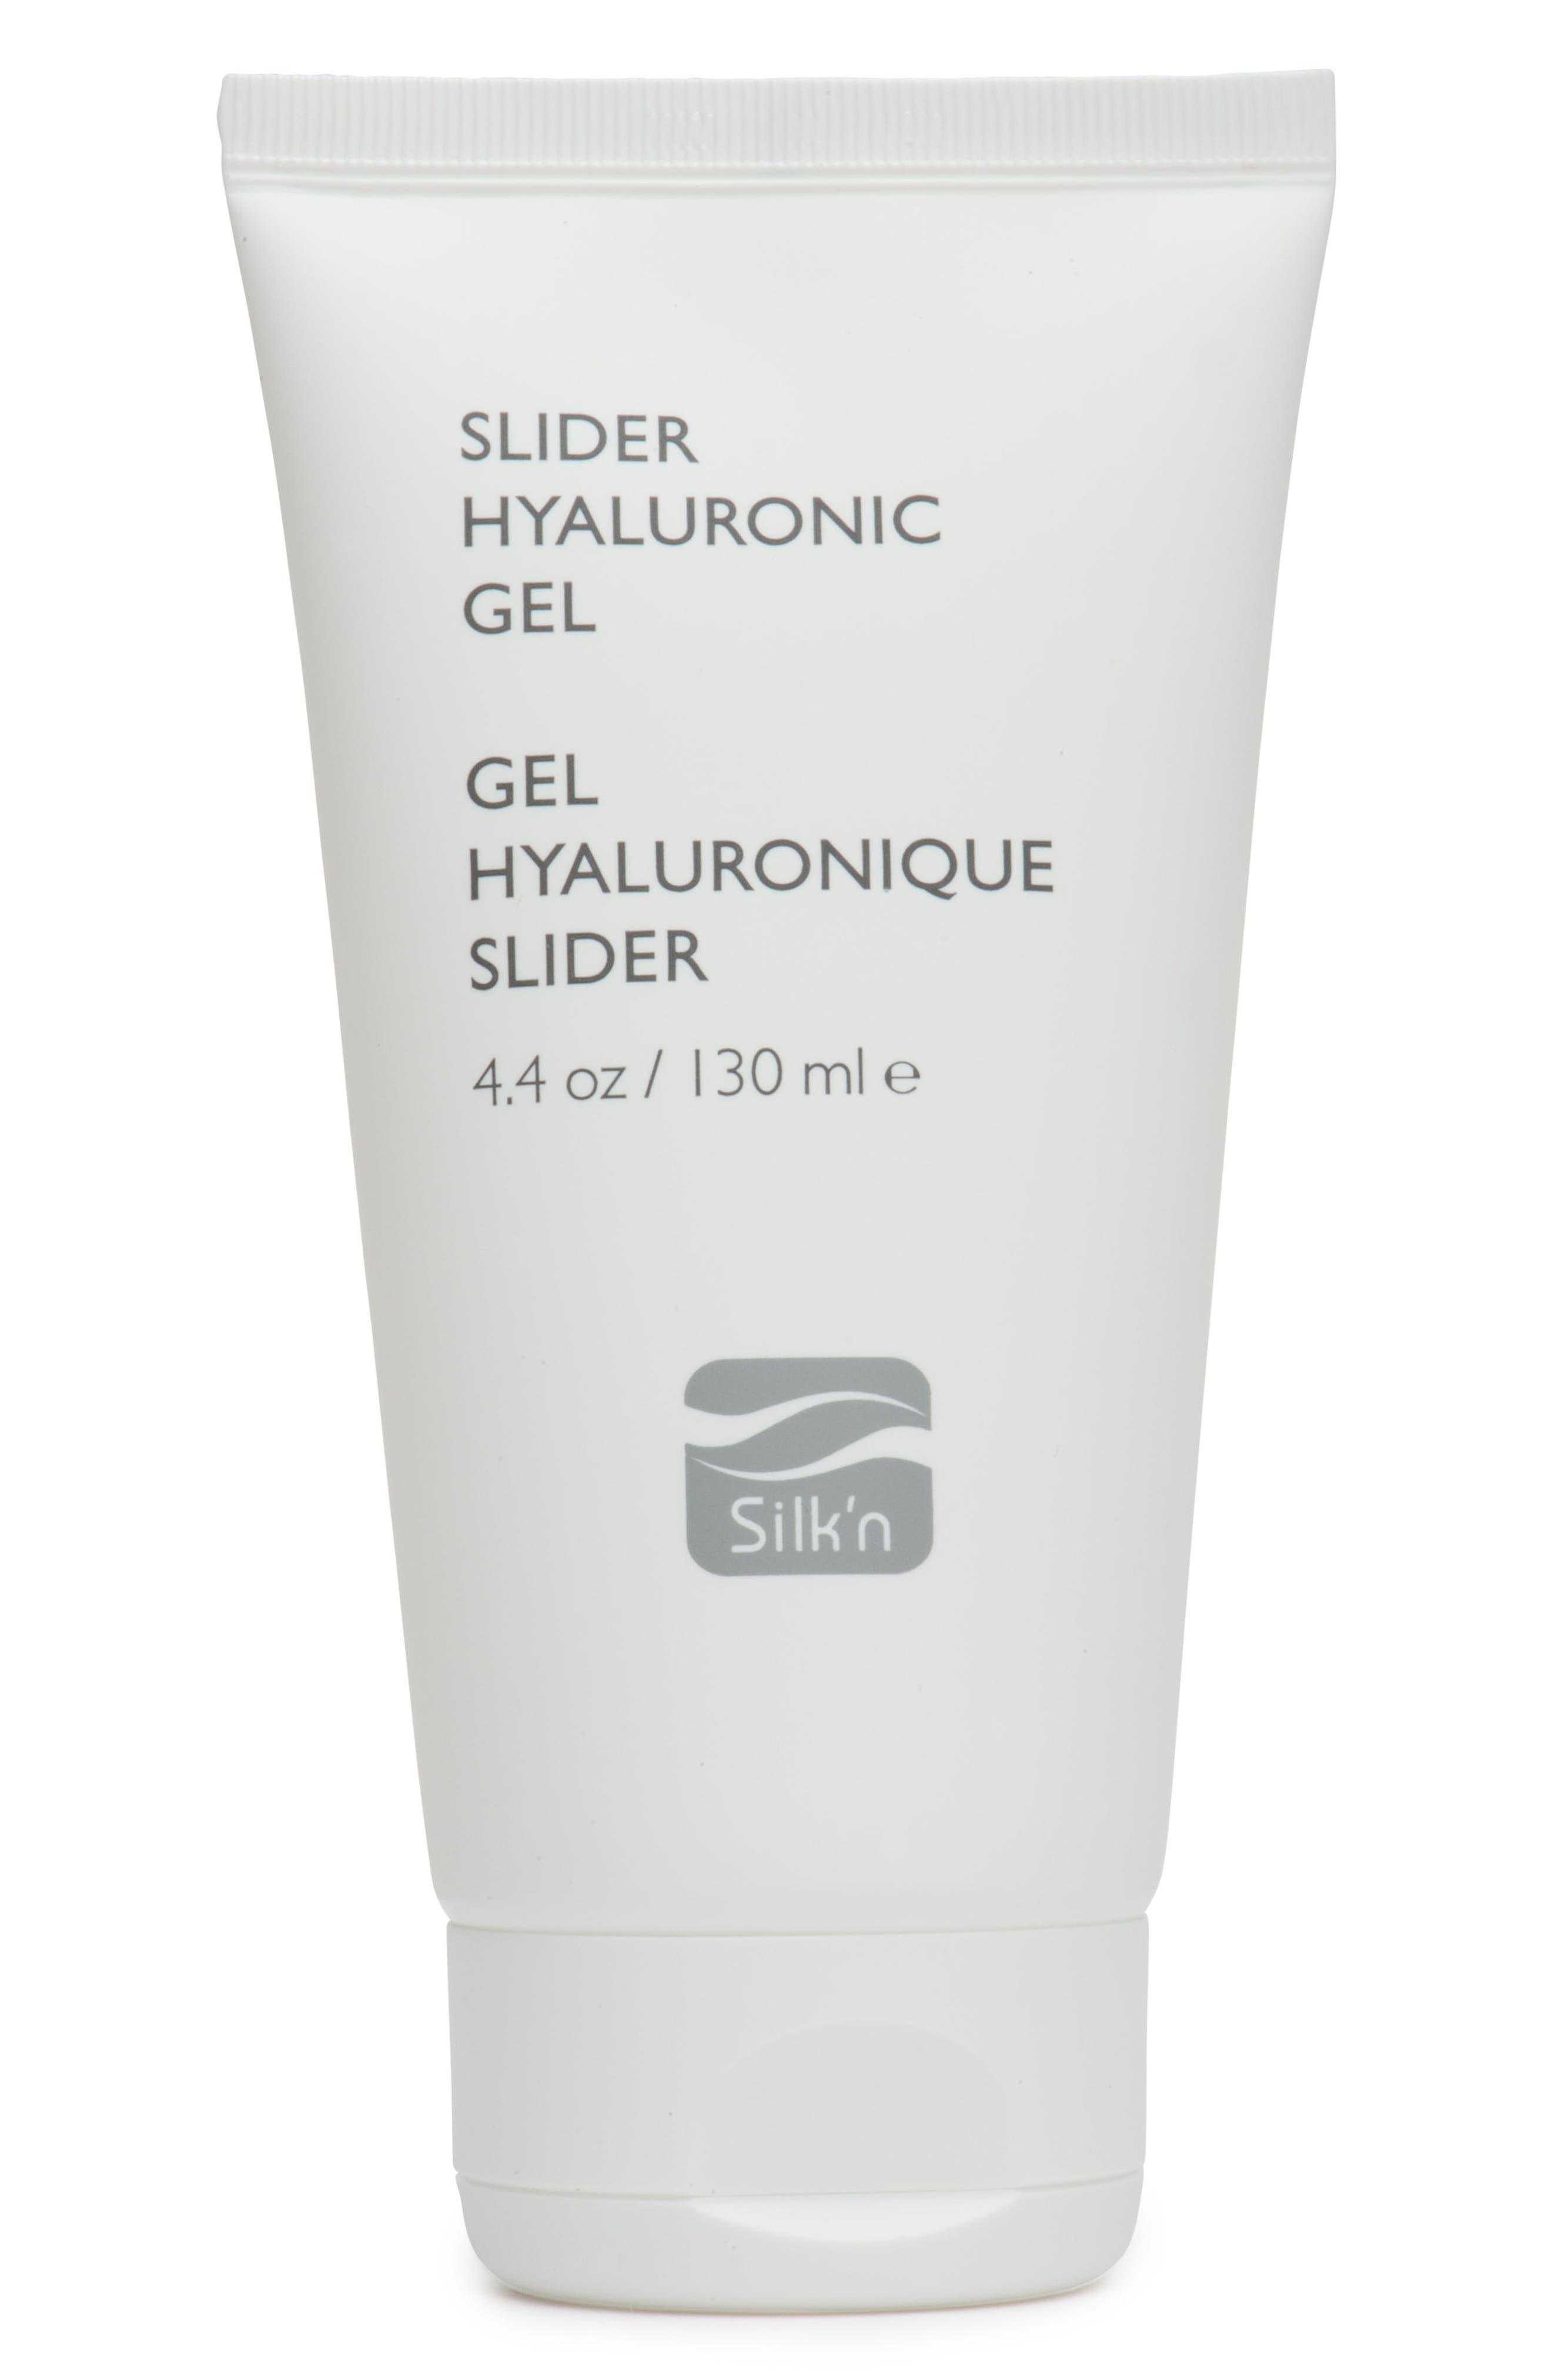 Main Image - Silk'n Slider Hyaluronic Gel